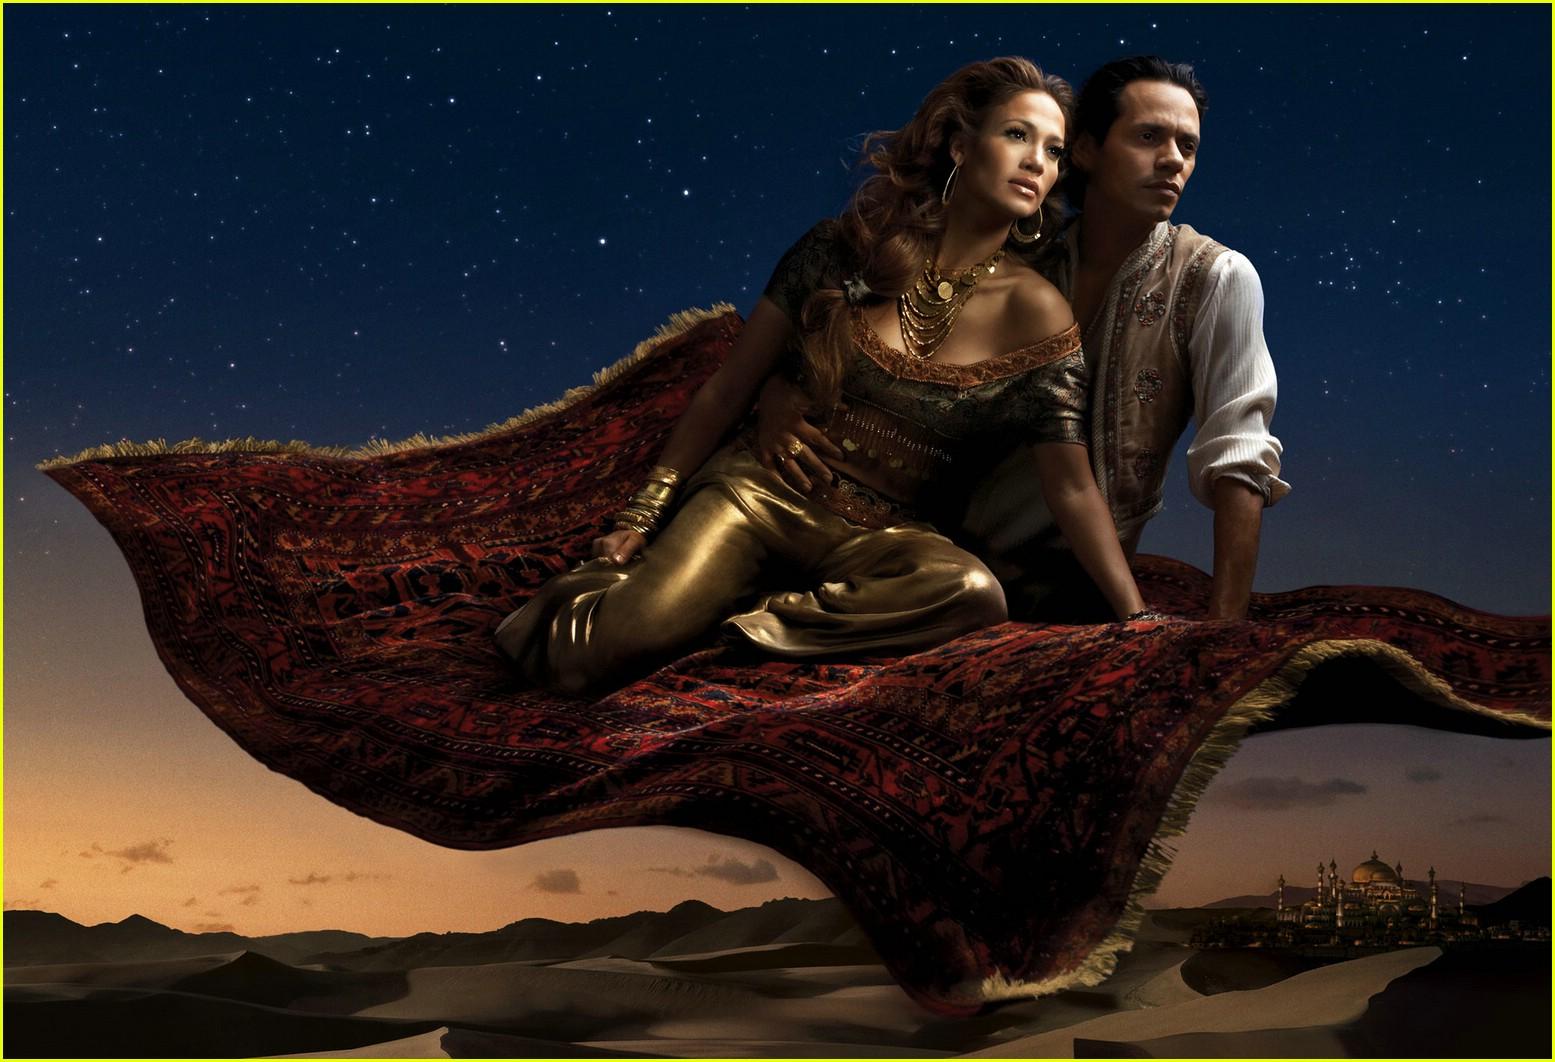 http://3.bp.blogspot.com/_vvDWoG_XX-0/TQn2aG1iOGI/AAAAAAAABGc/ghhneICYMz4/s1600/disney-dream-ads-annie-leibovitz-09.jpg